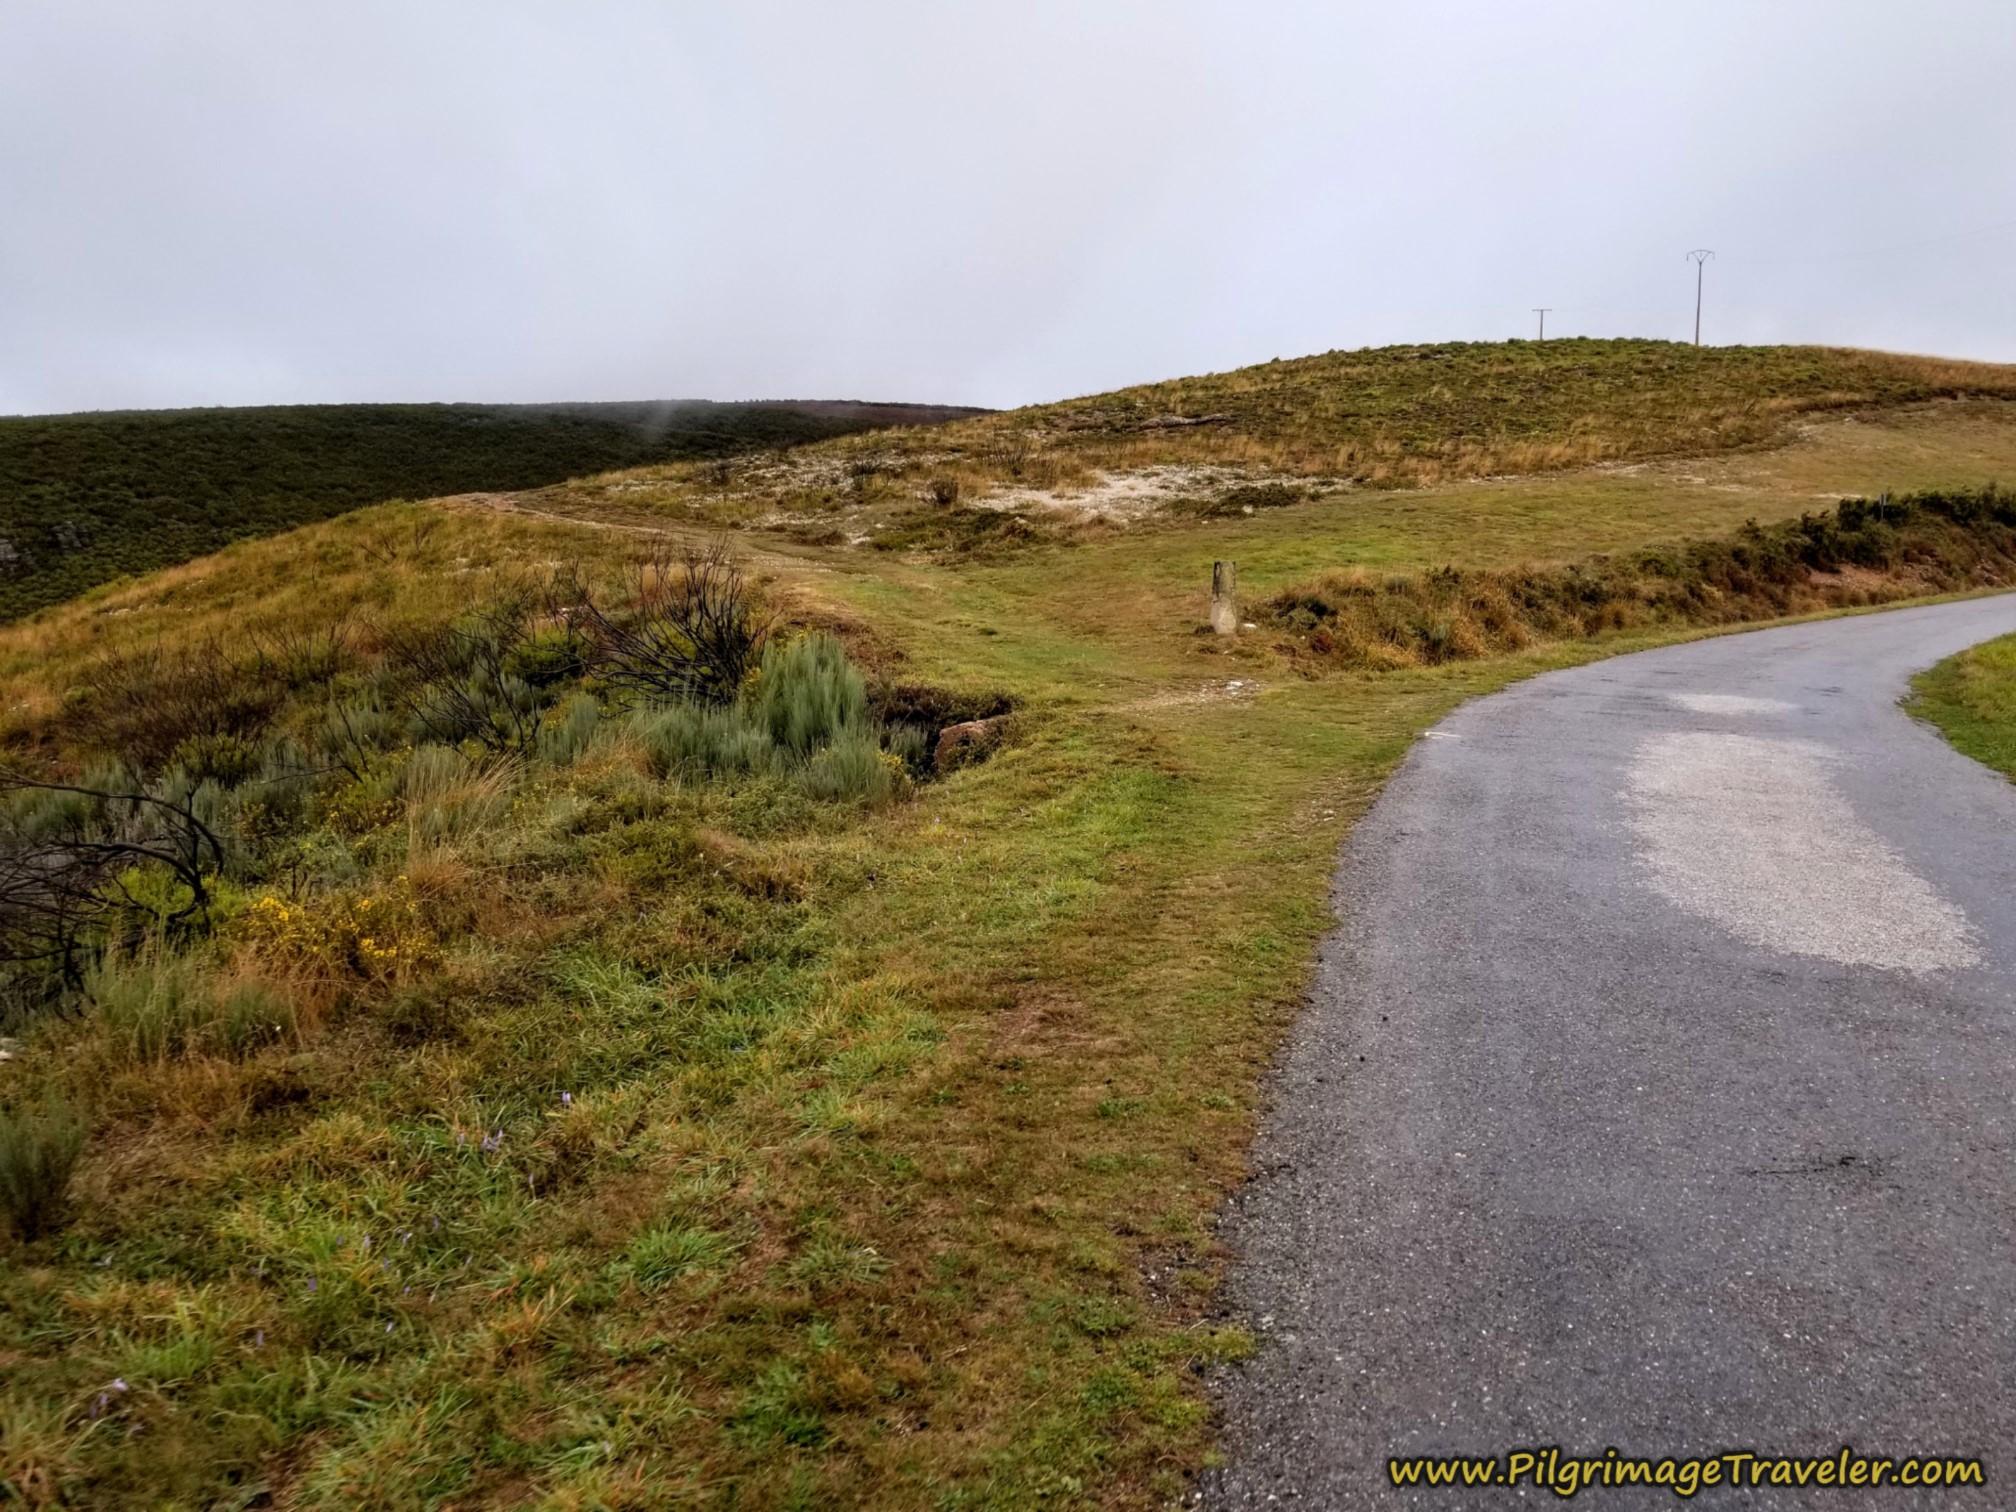 Turn Left Onto Lane